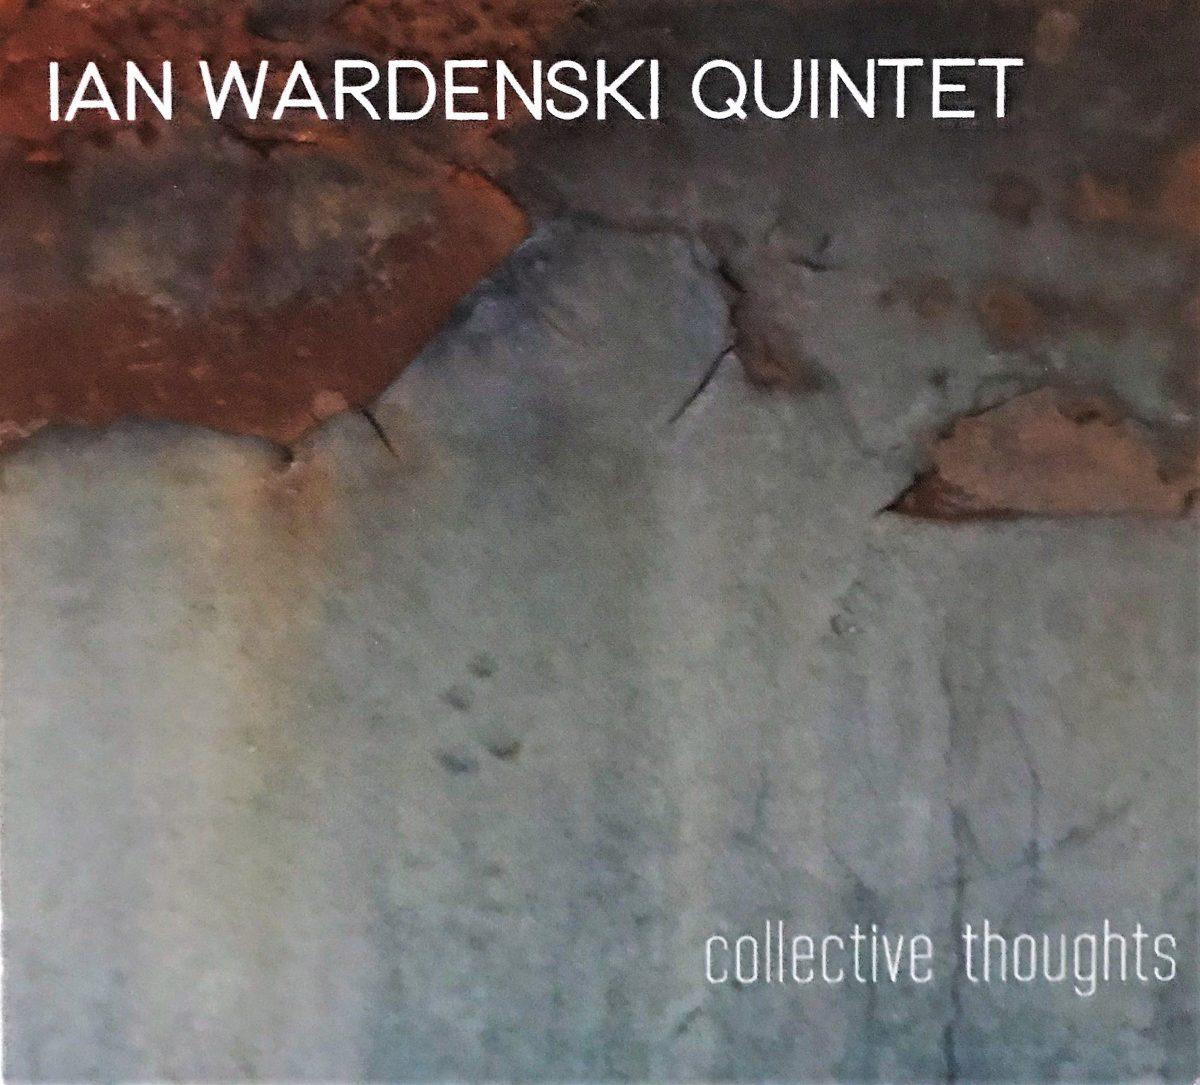 Ian Wardenski Quintet, Collective Thoughts | The Vinyl Anachronist